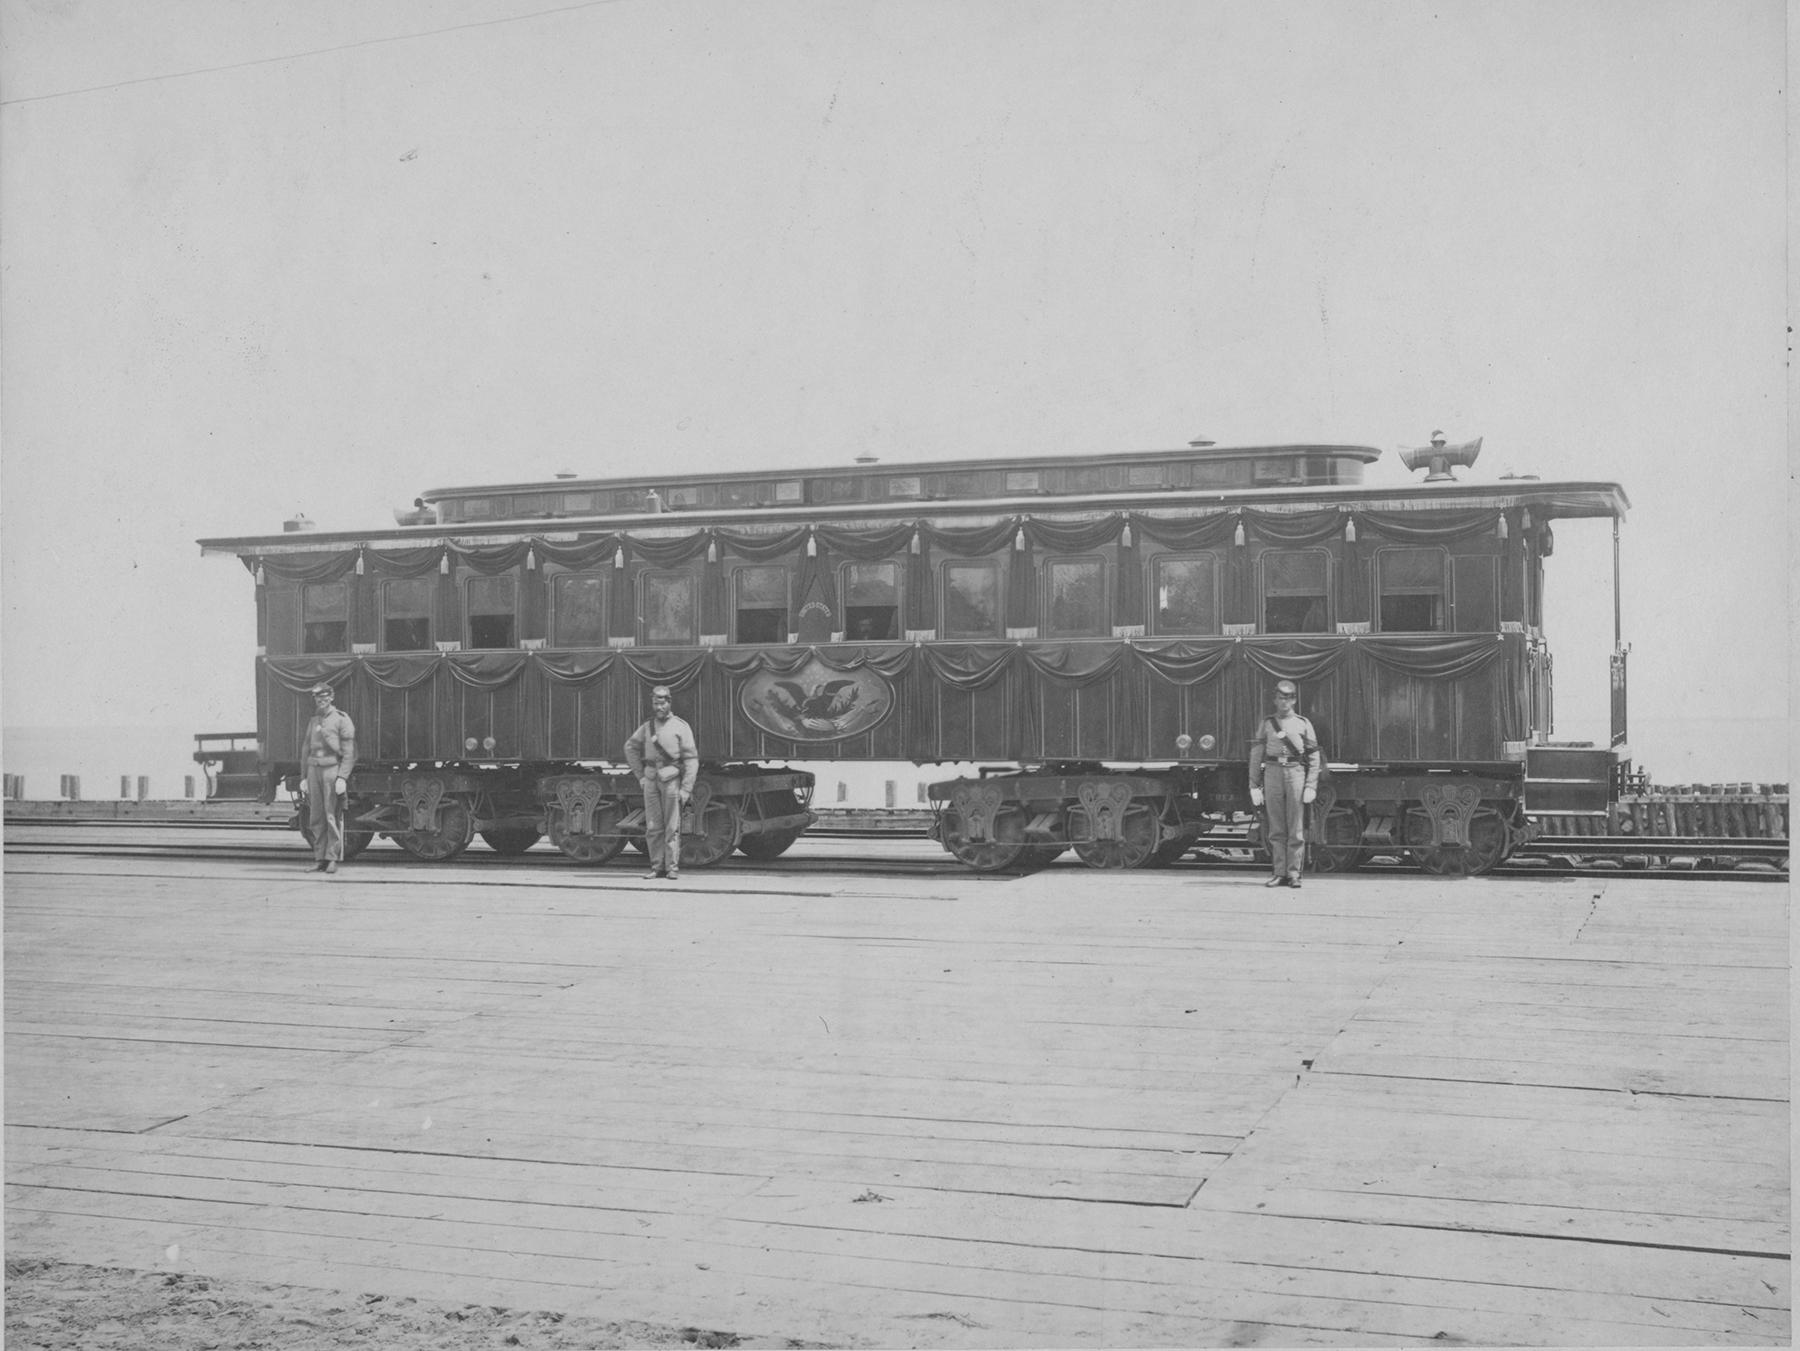 Lincoln's Funeral Train Car